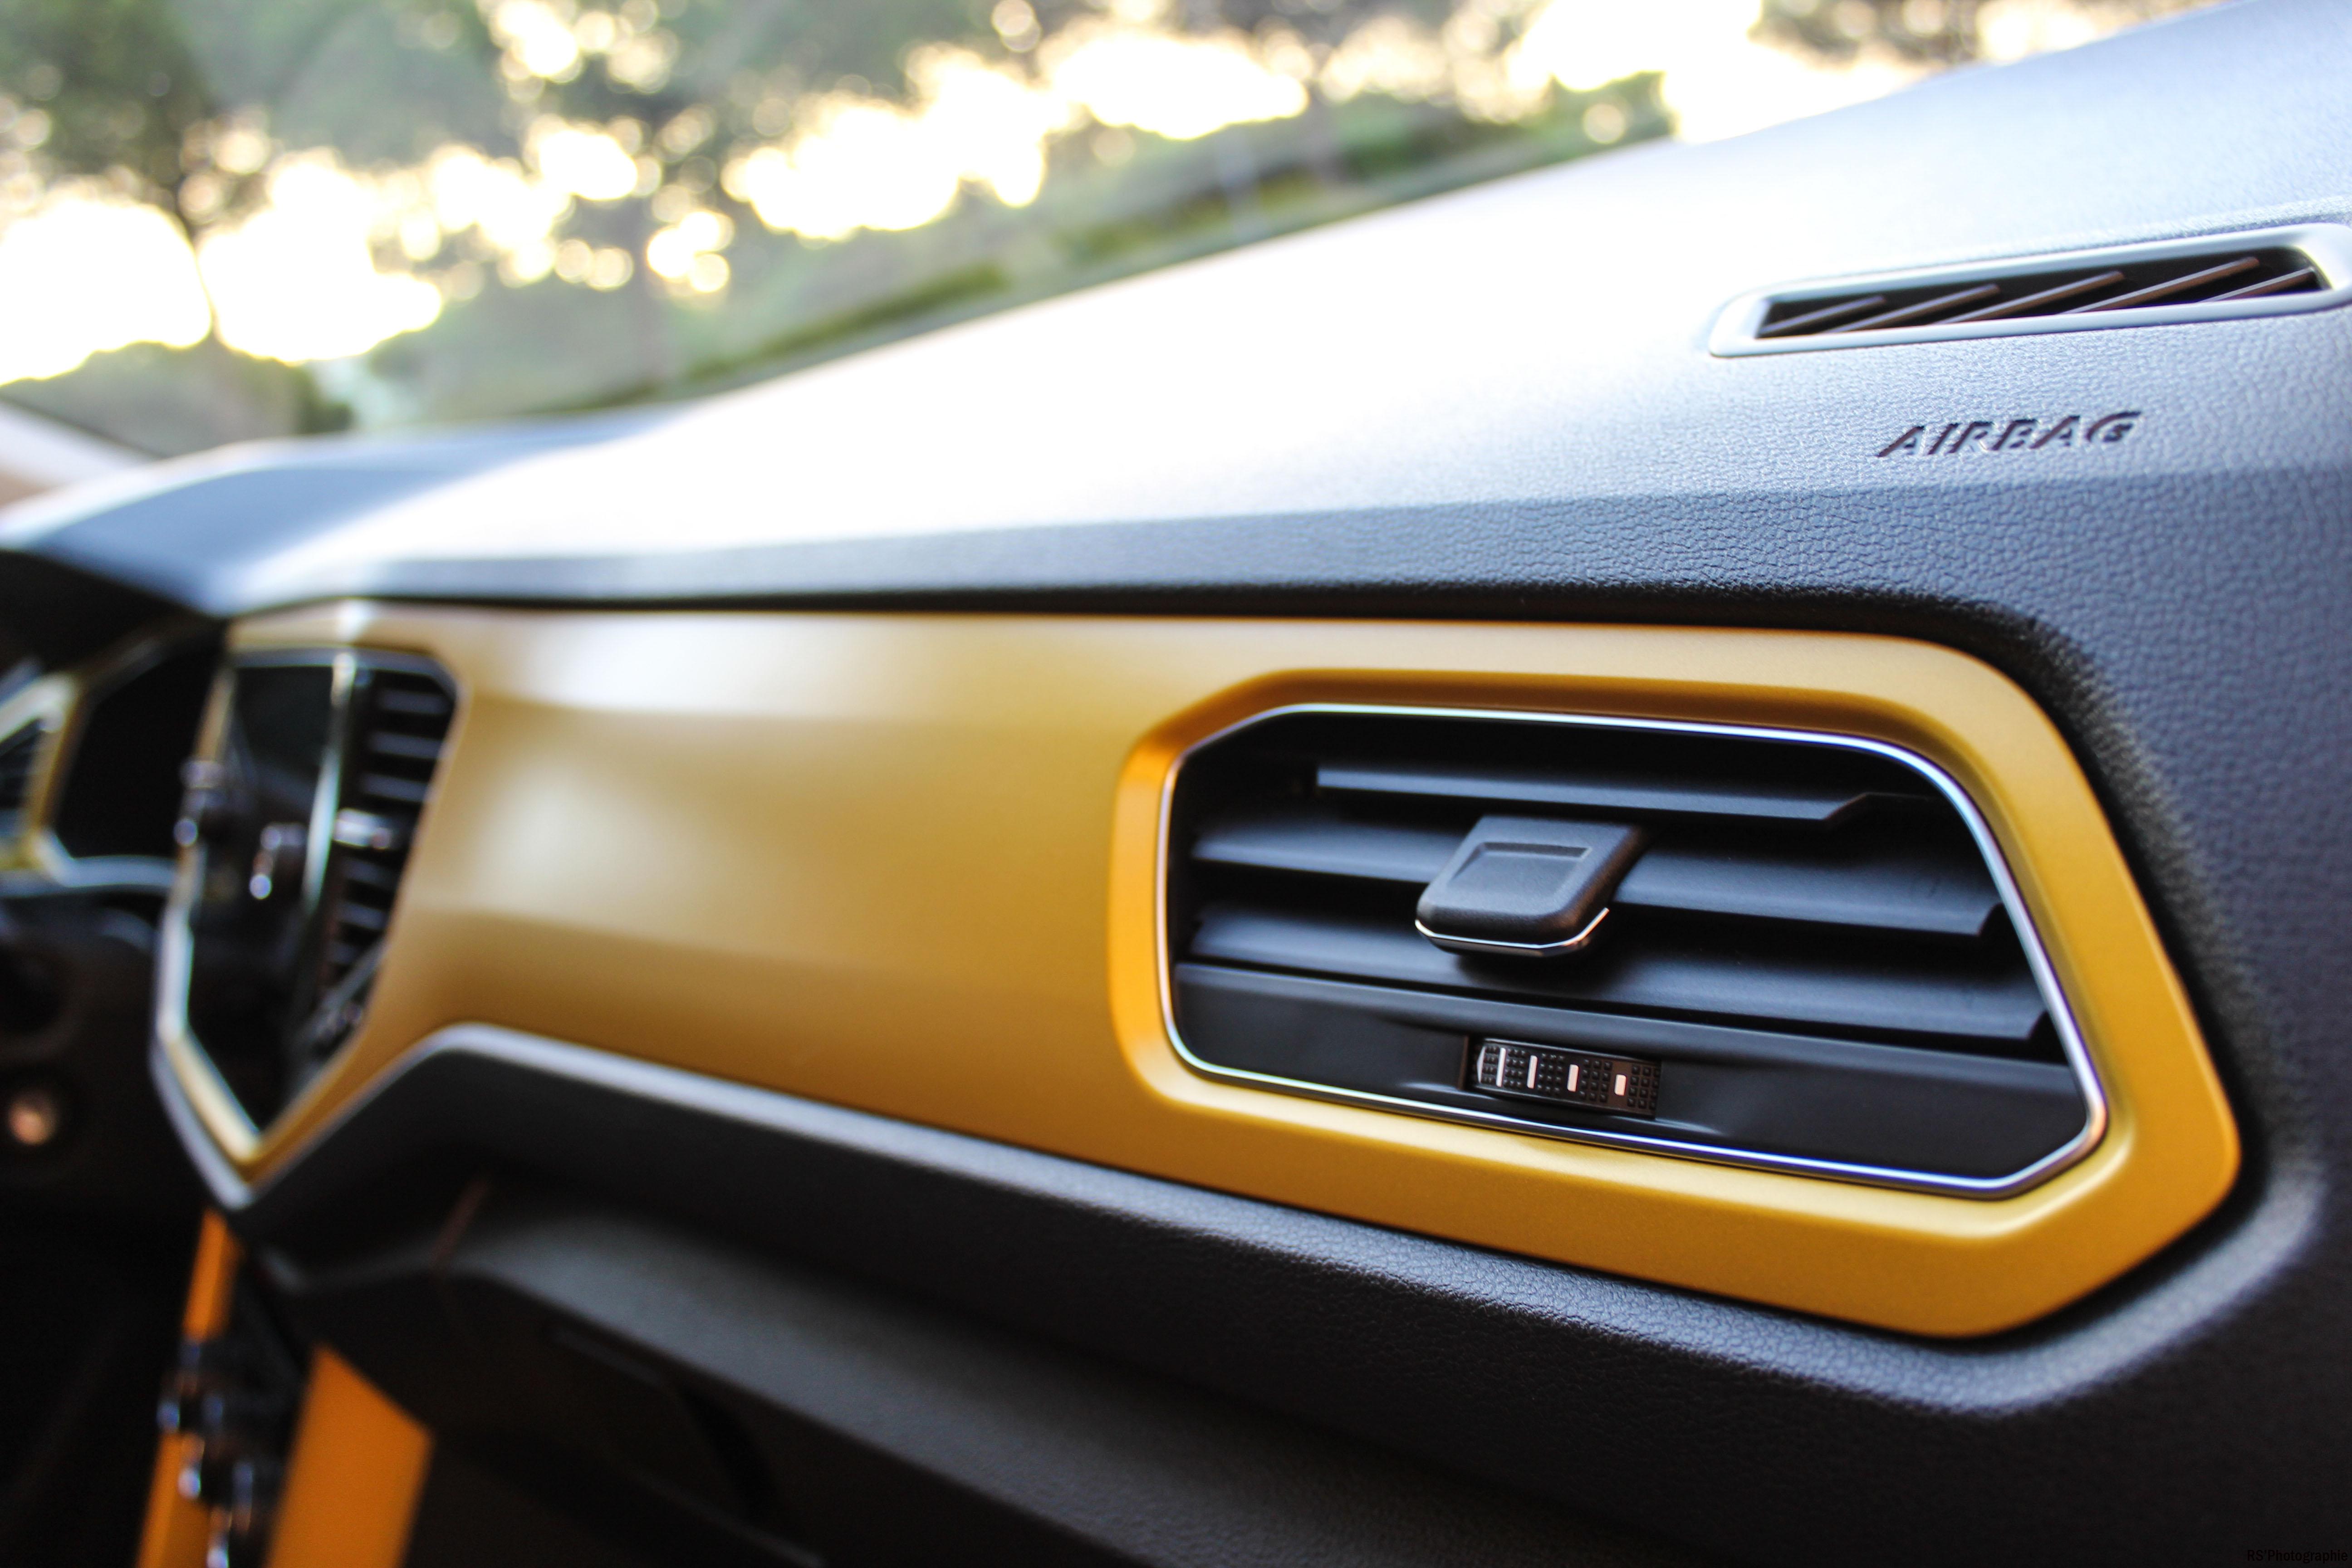 Volkswagentroc73-vw-t-roc-intérieur-onboard-Arnaud Demasier-RSPhotographie